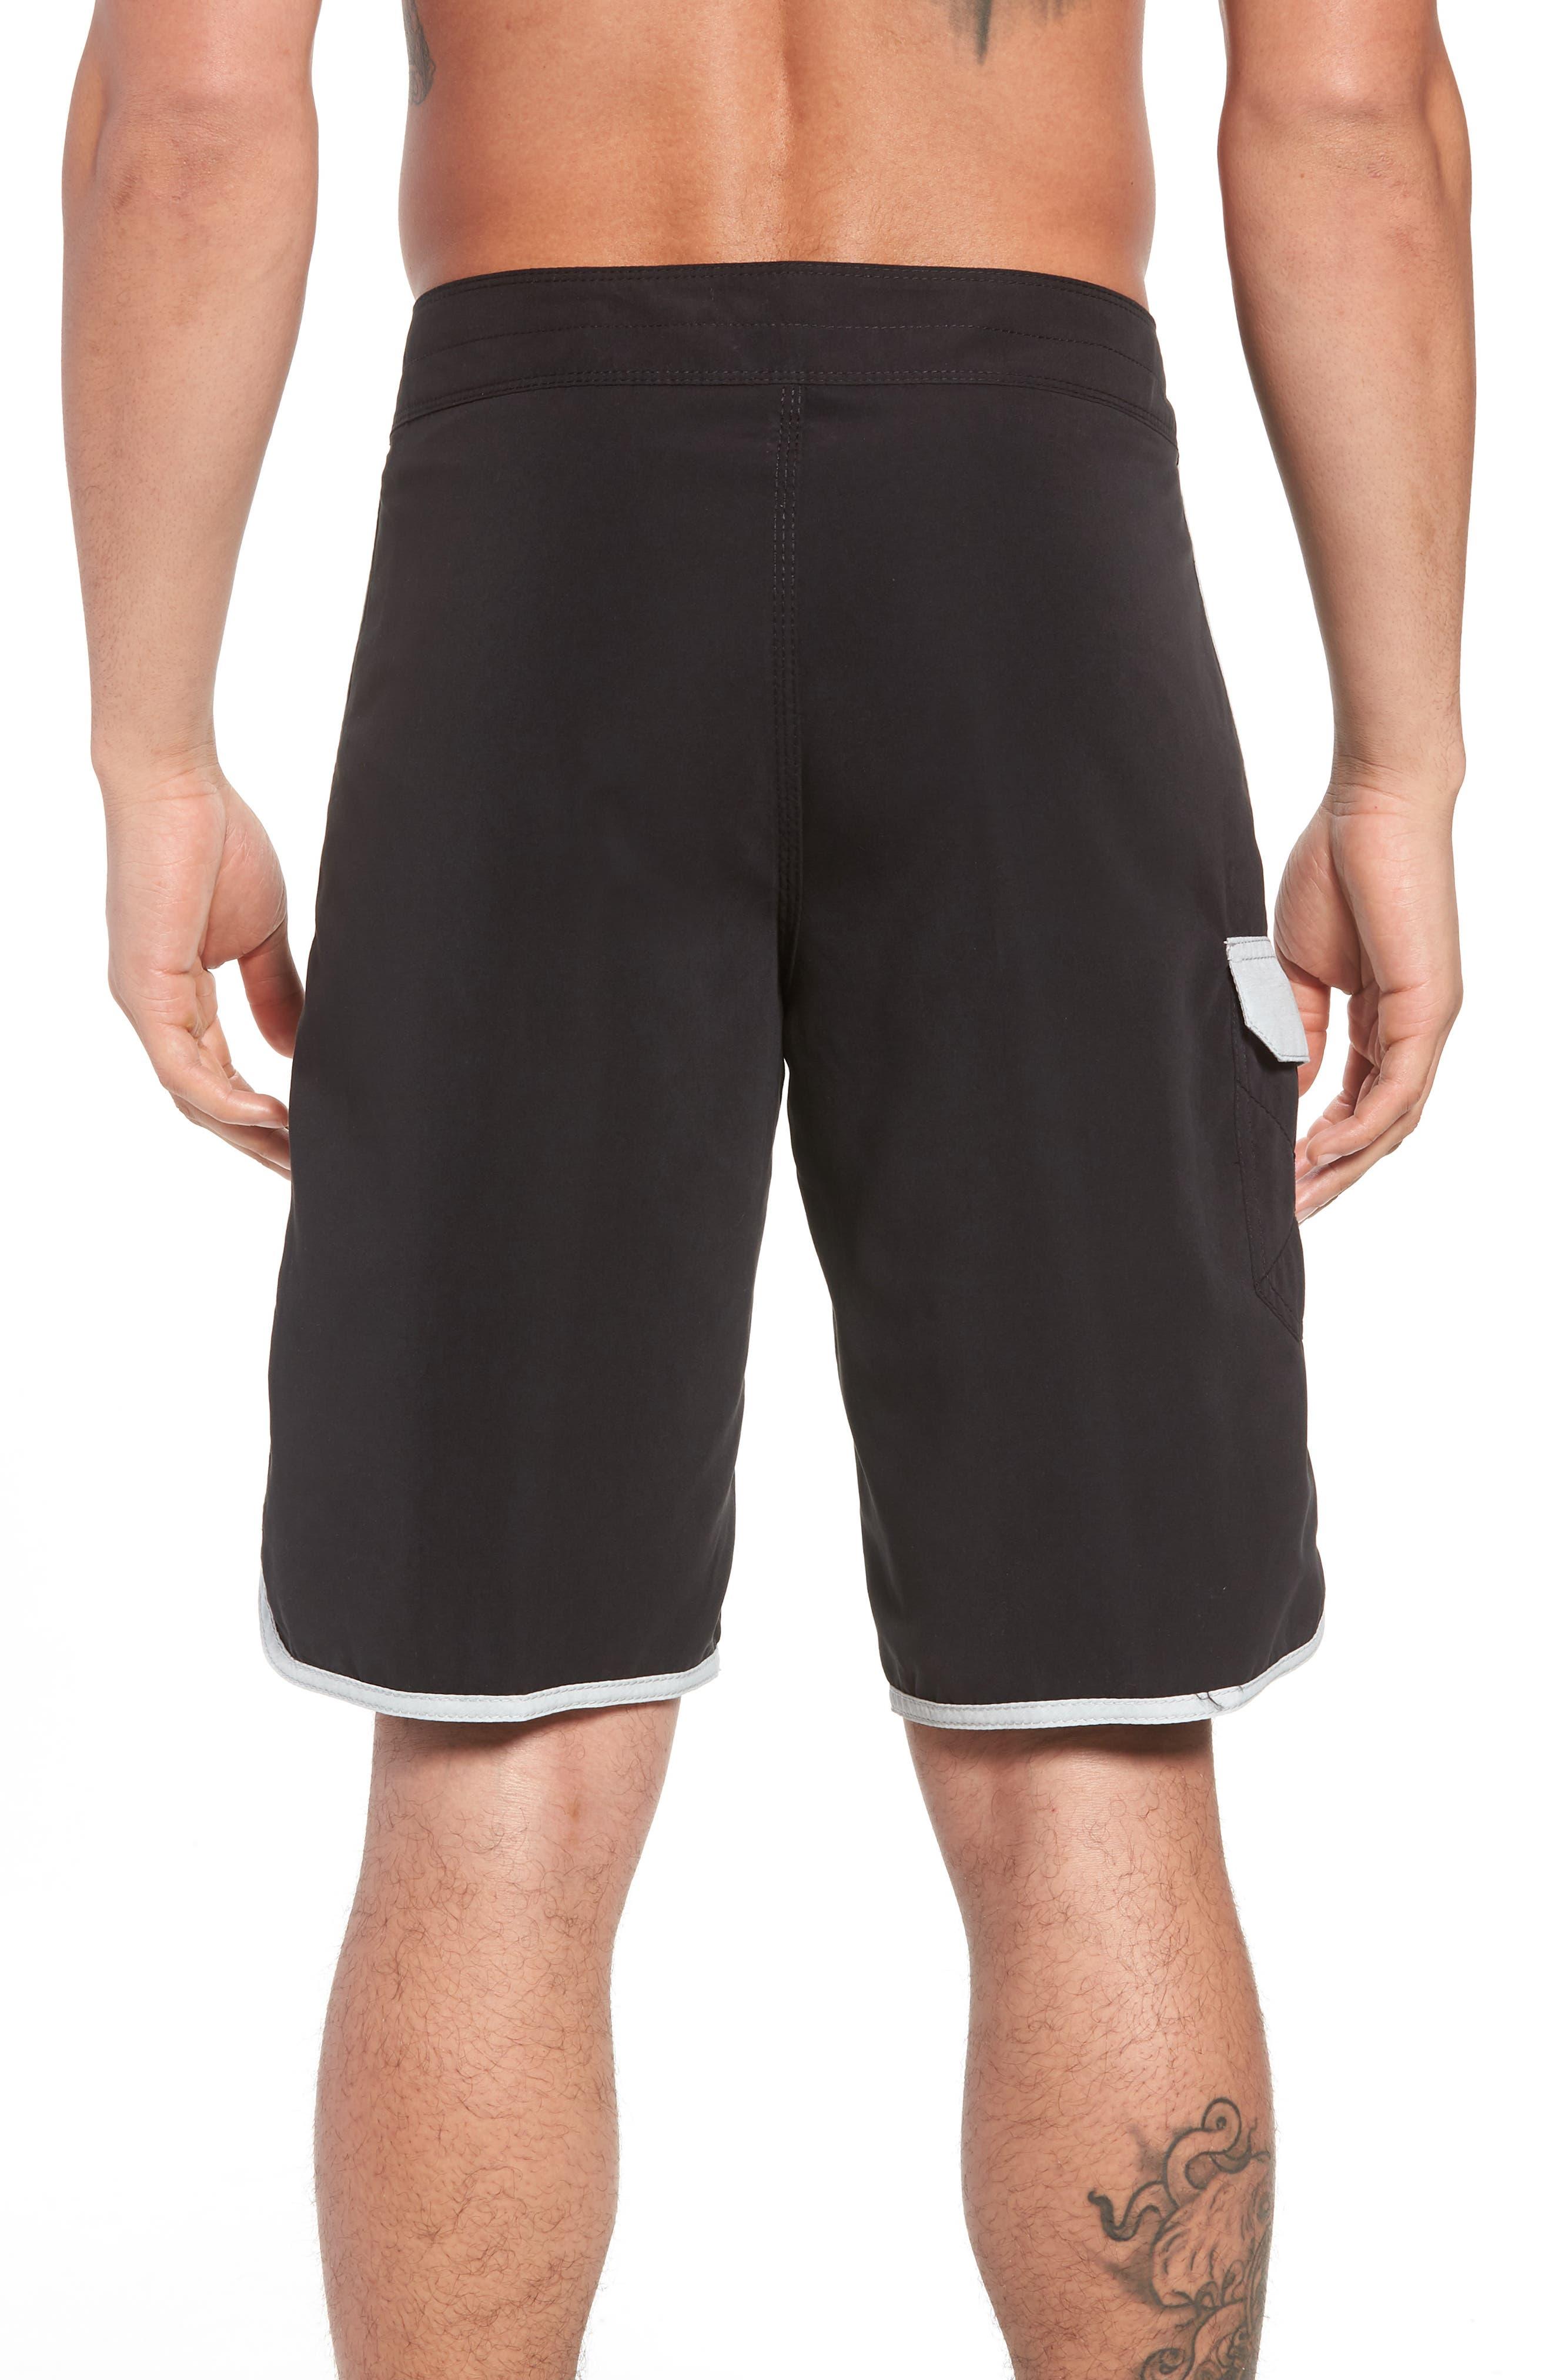 73 OG Board Shorts,                             Alternate thumbnail 2, color,                             001